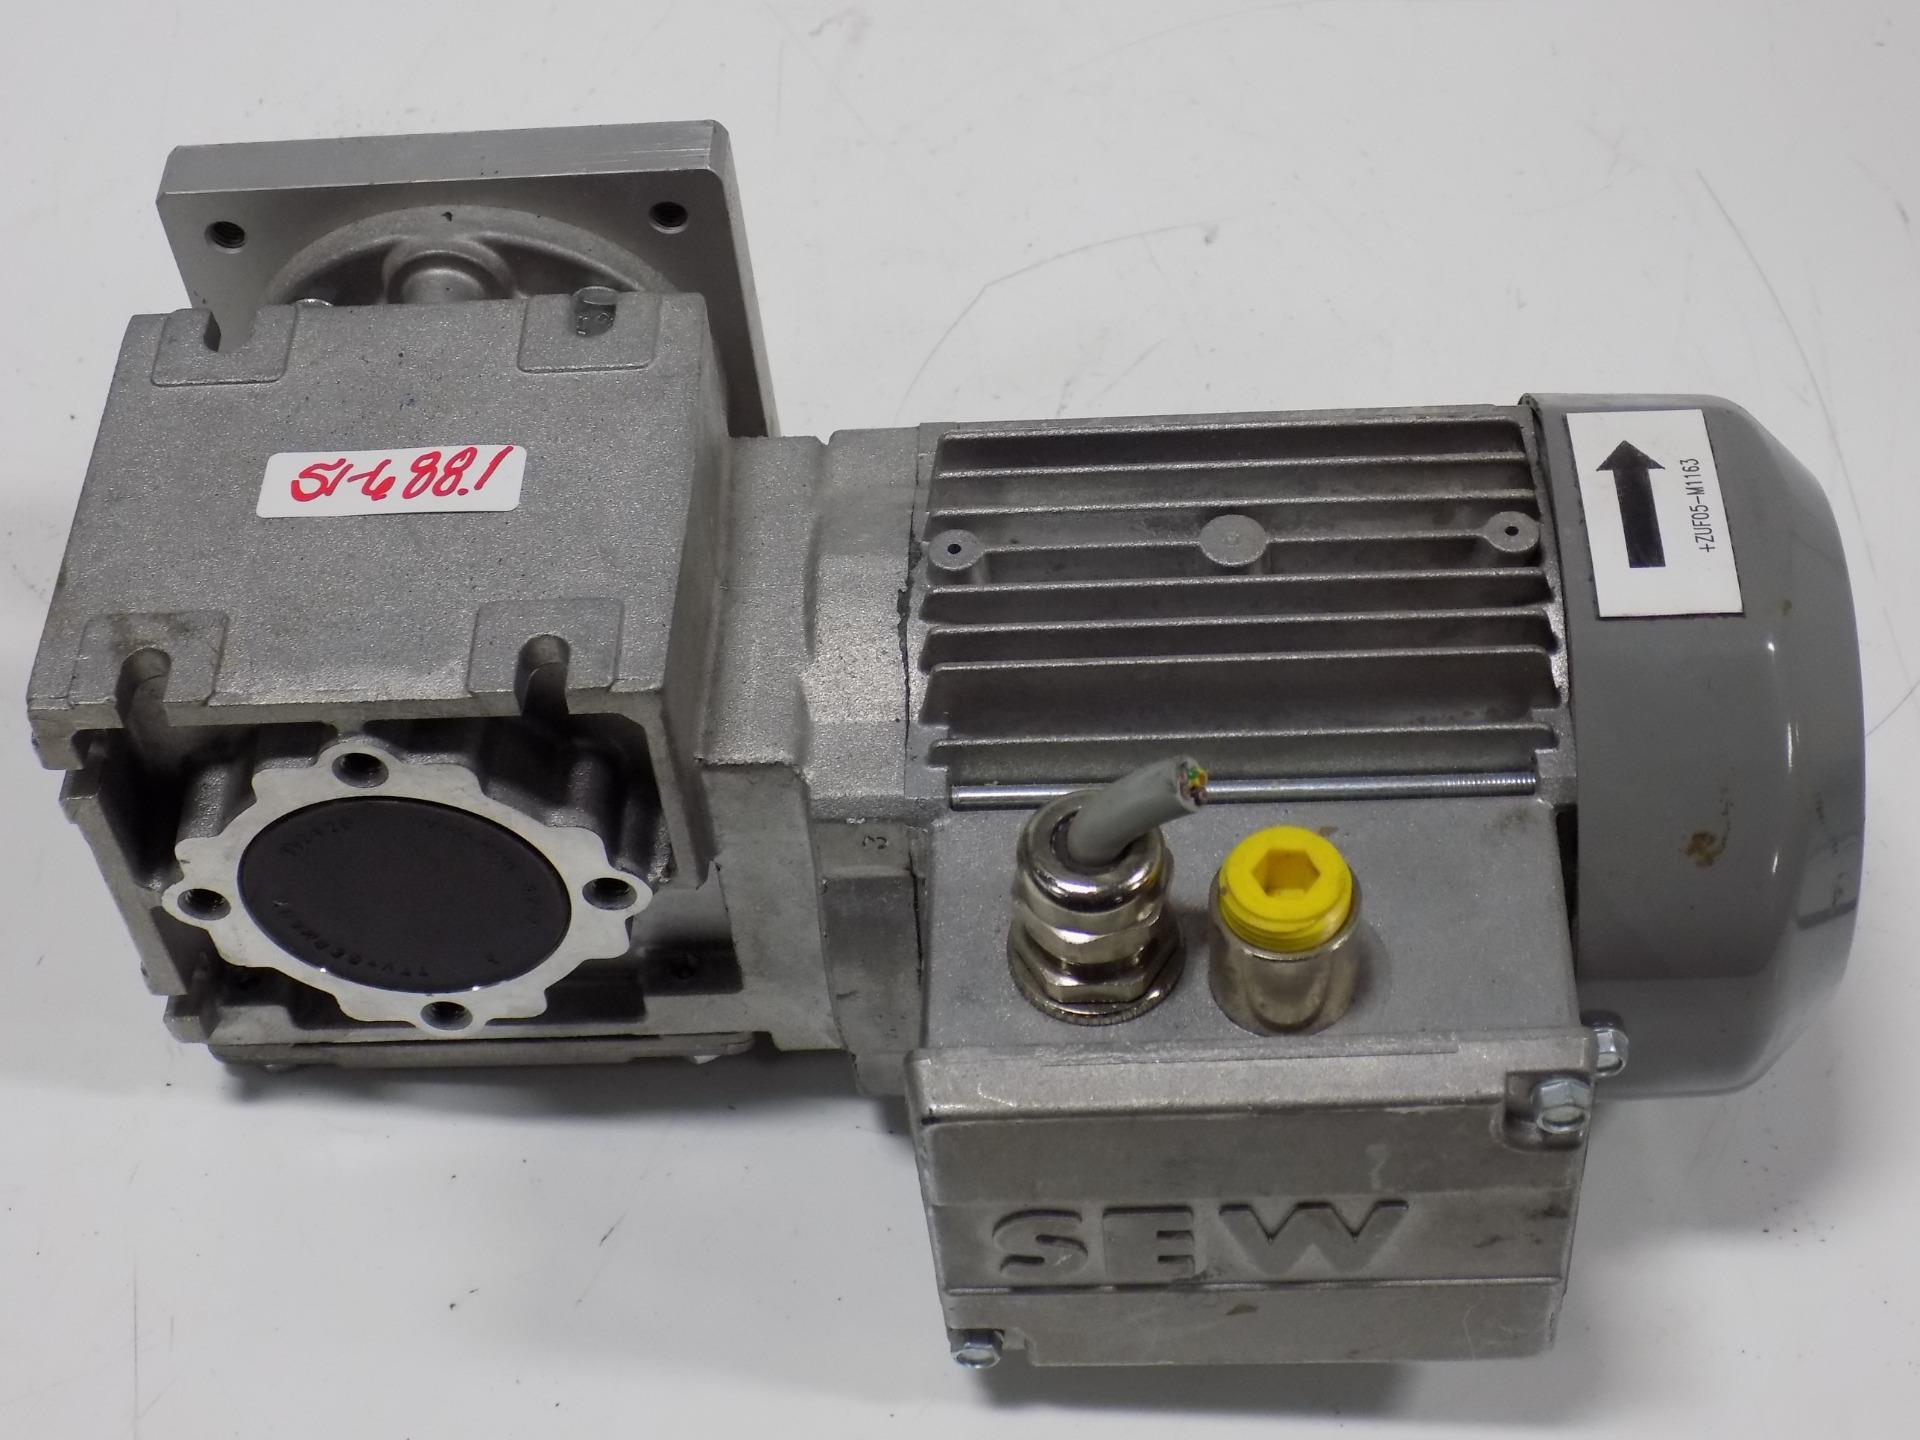 Sew eurodrive gear motor 3 phase wf10dt56m4 ebay for Sew eurodrive gear motor